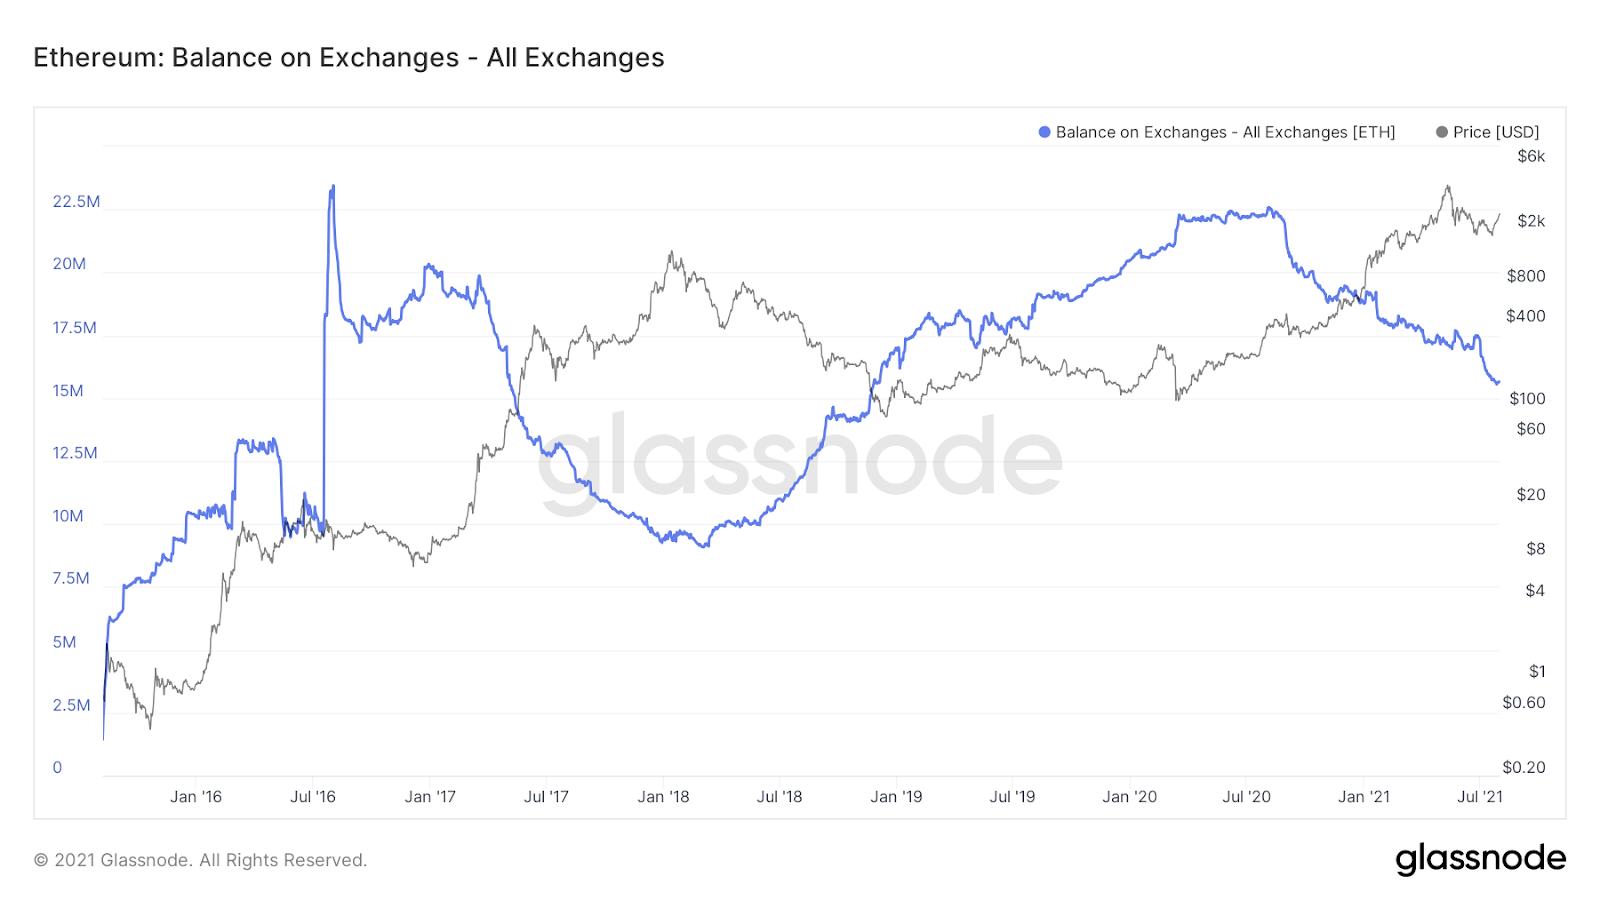 Ethereum Balance on Exchanges Chart Quelle: Glassnode